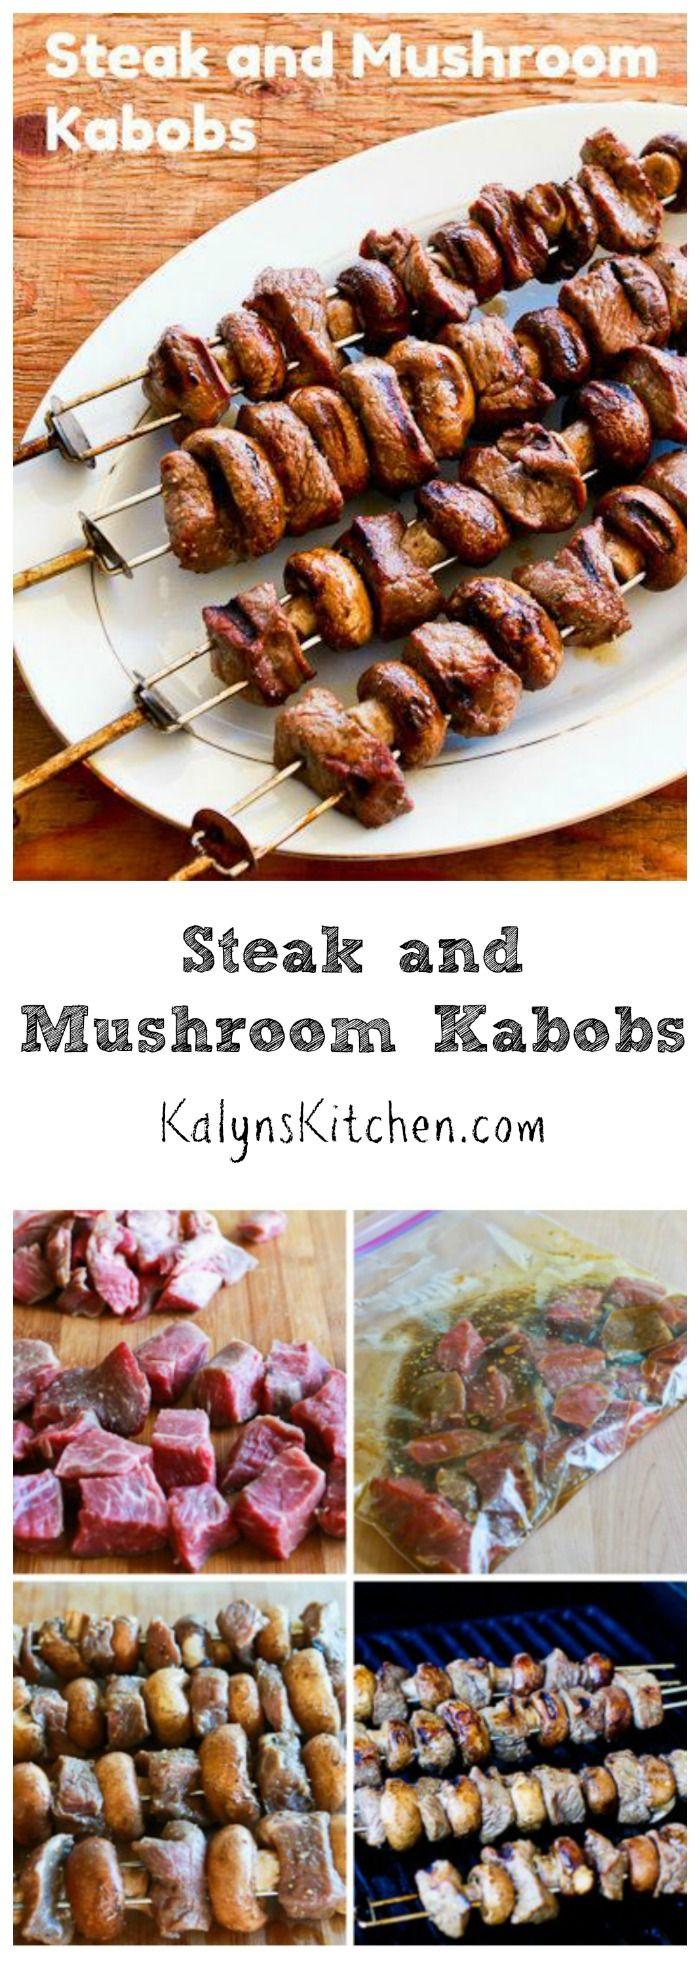 Low-Carb Steak and Mushroom Kabobs